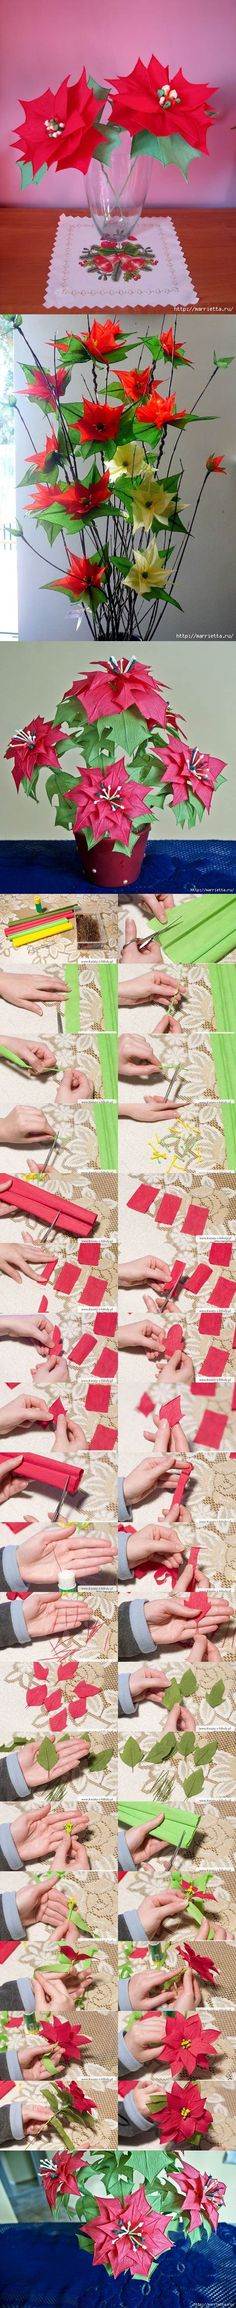 DIY Crepe Paper Poinsettia the Christmas Star   iCreativeIdeas.com Like Us on Facebook == https://www.facebook.com/icreativeideas